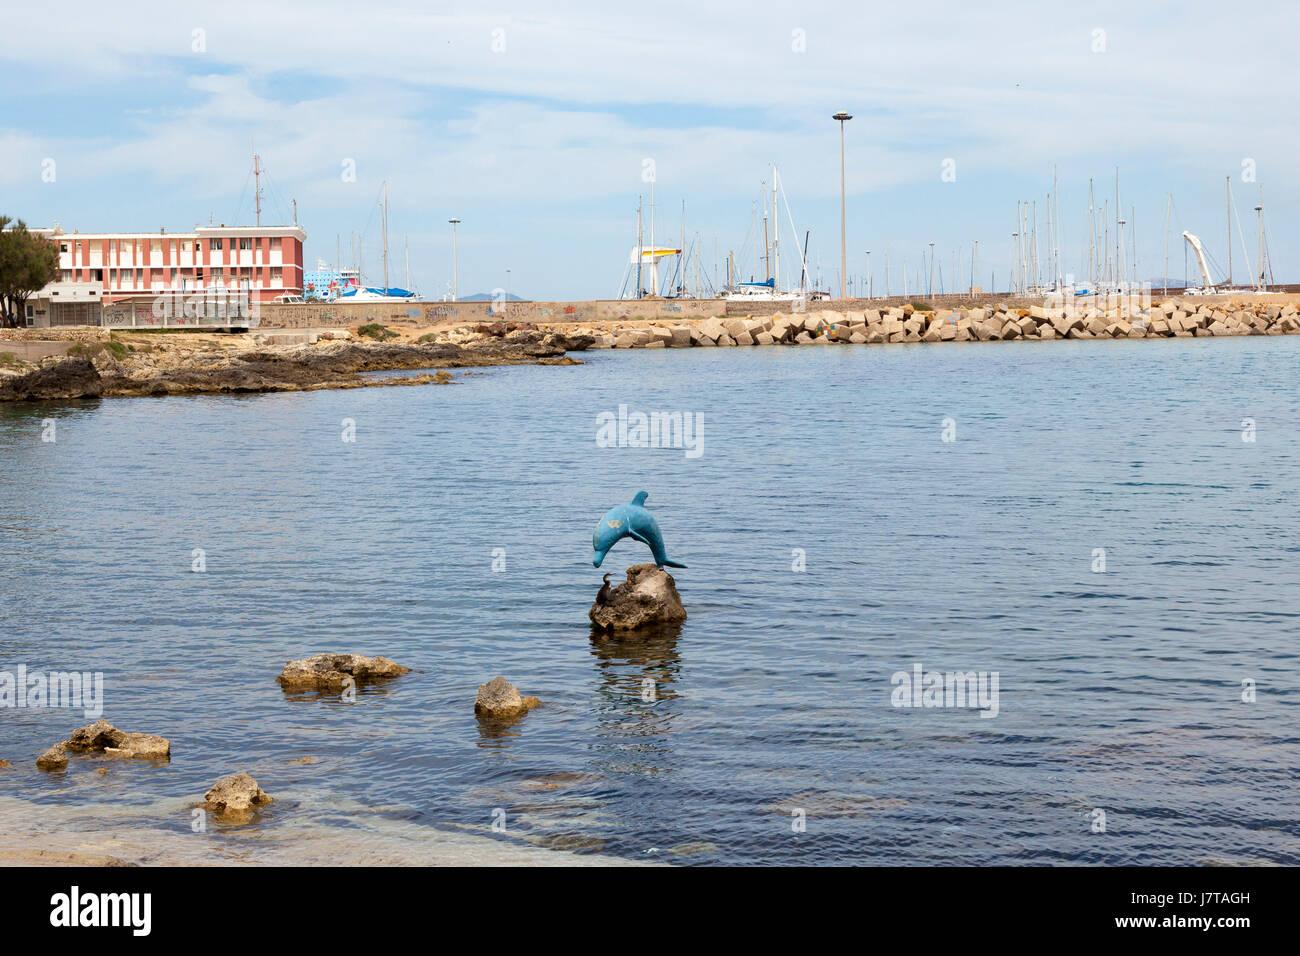 The coastline of Northern Sardinia at Porto Torres - Stock Image